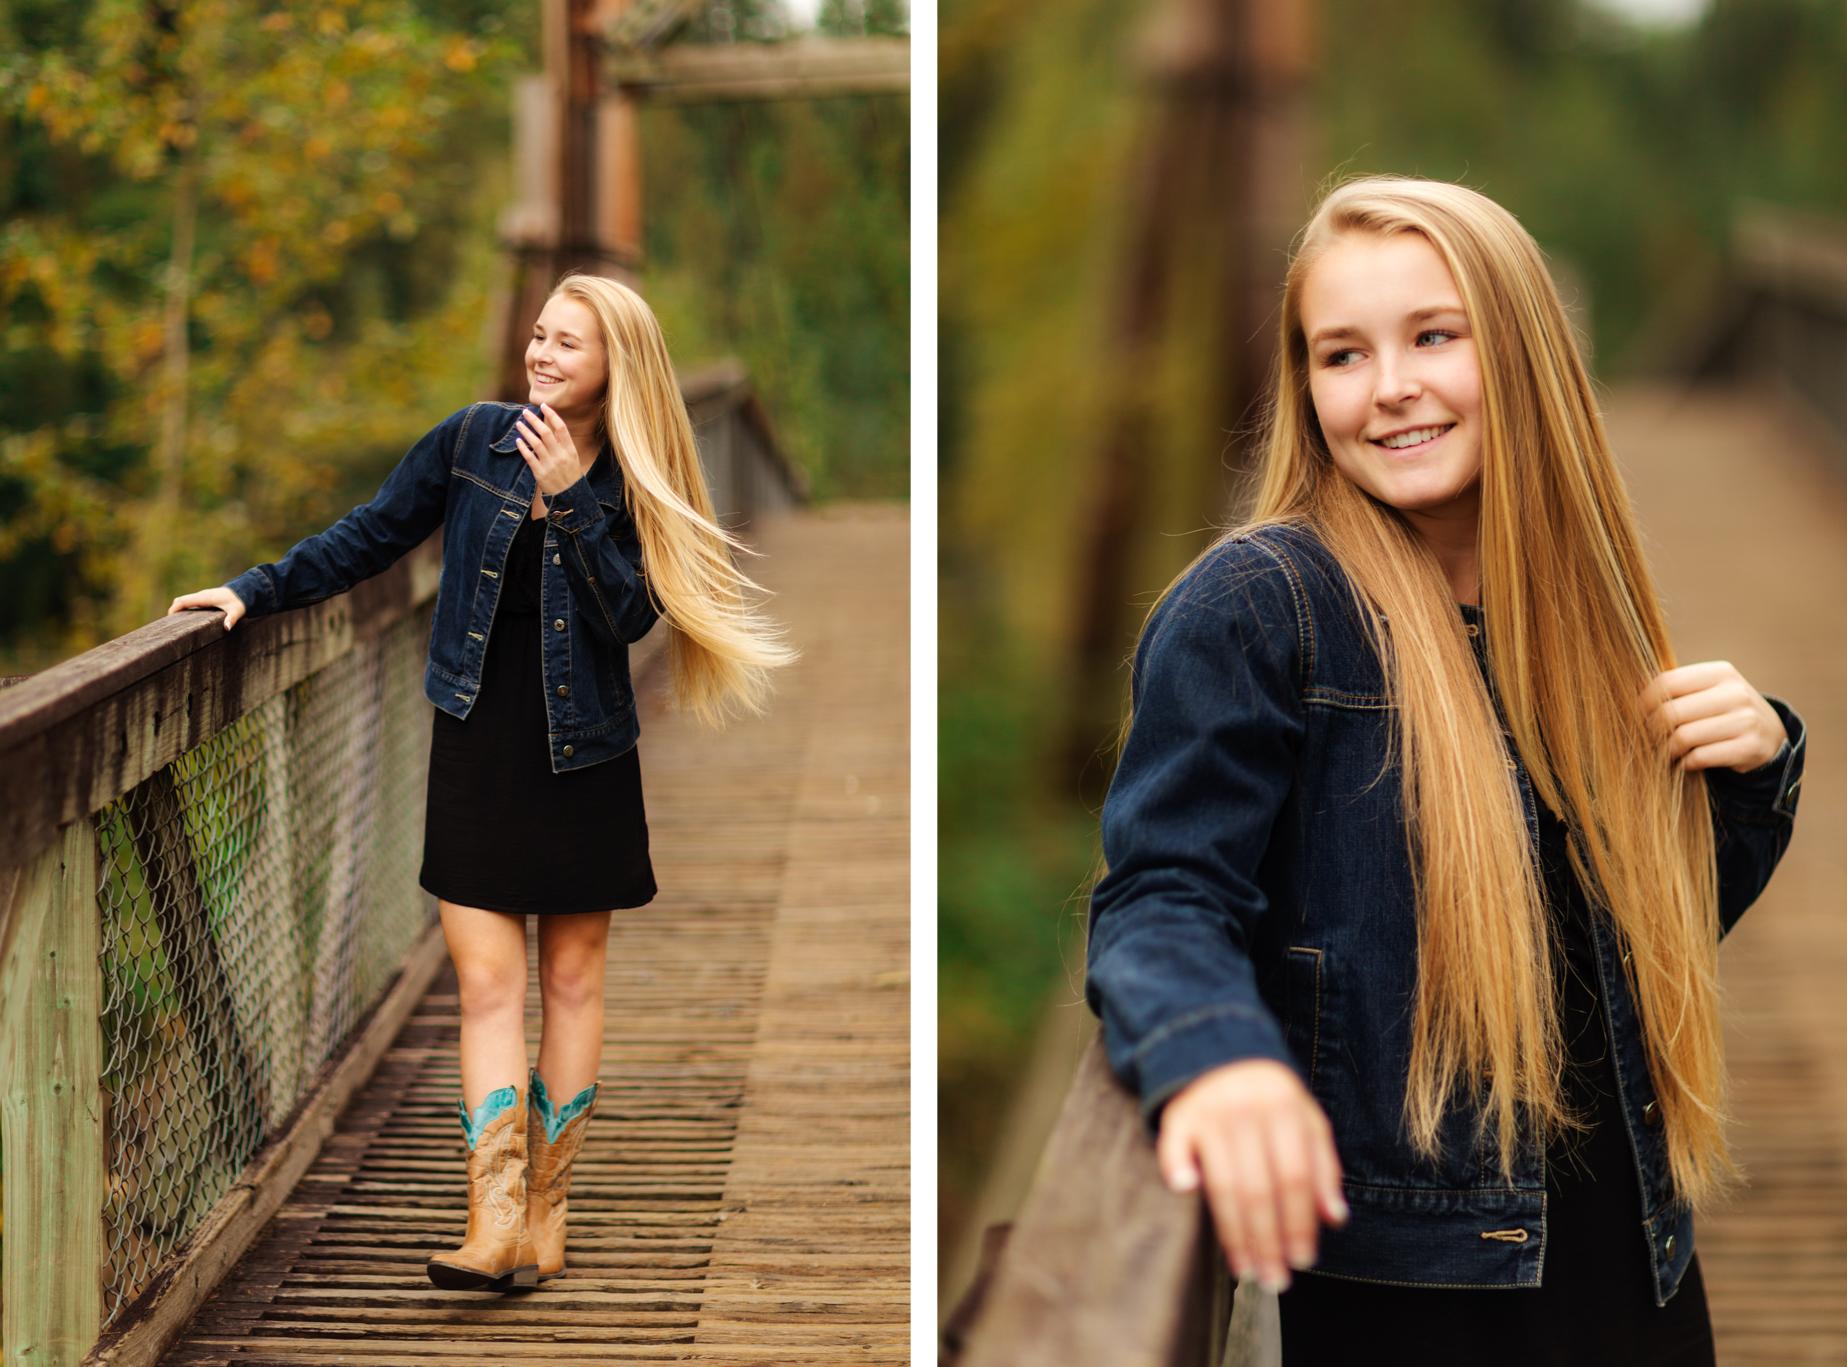 ariellanoellephotography-senior-portraits-highschool-portraiture-monroe-washington-seattle-duvall-woodinville-redmond-kirkland-area.jpg